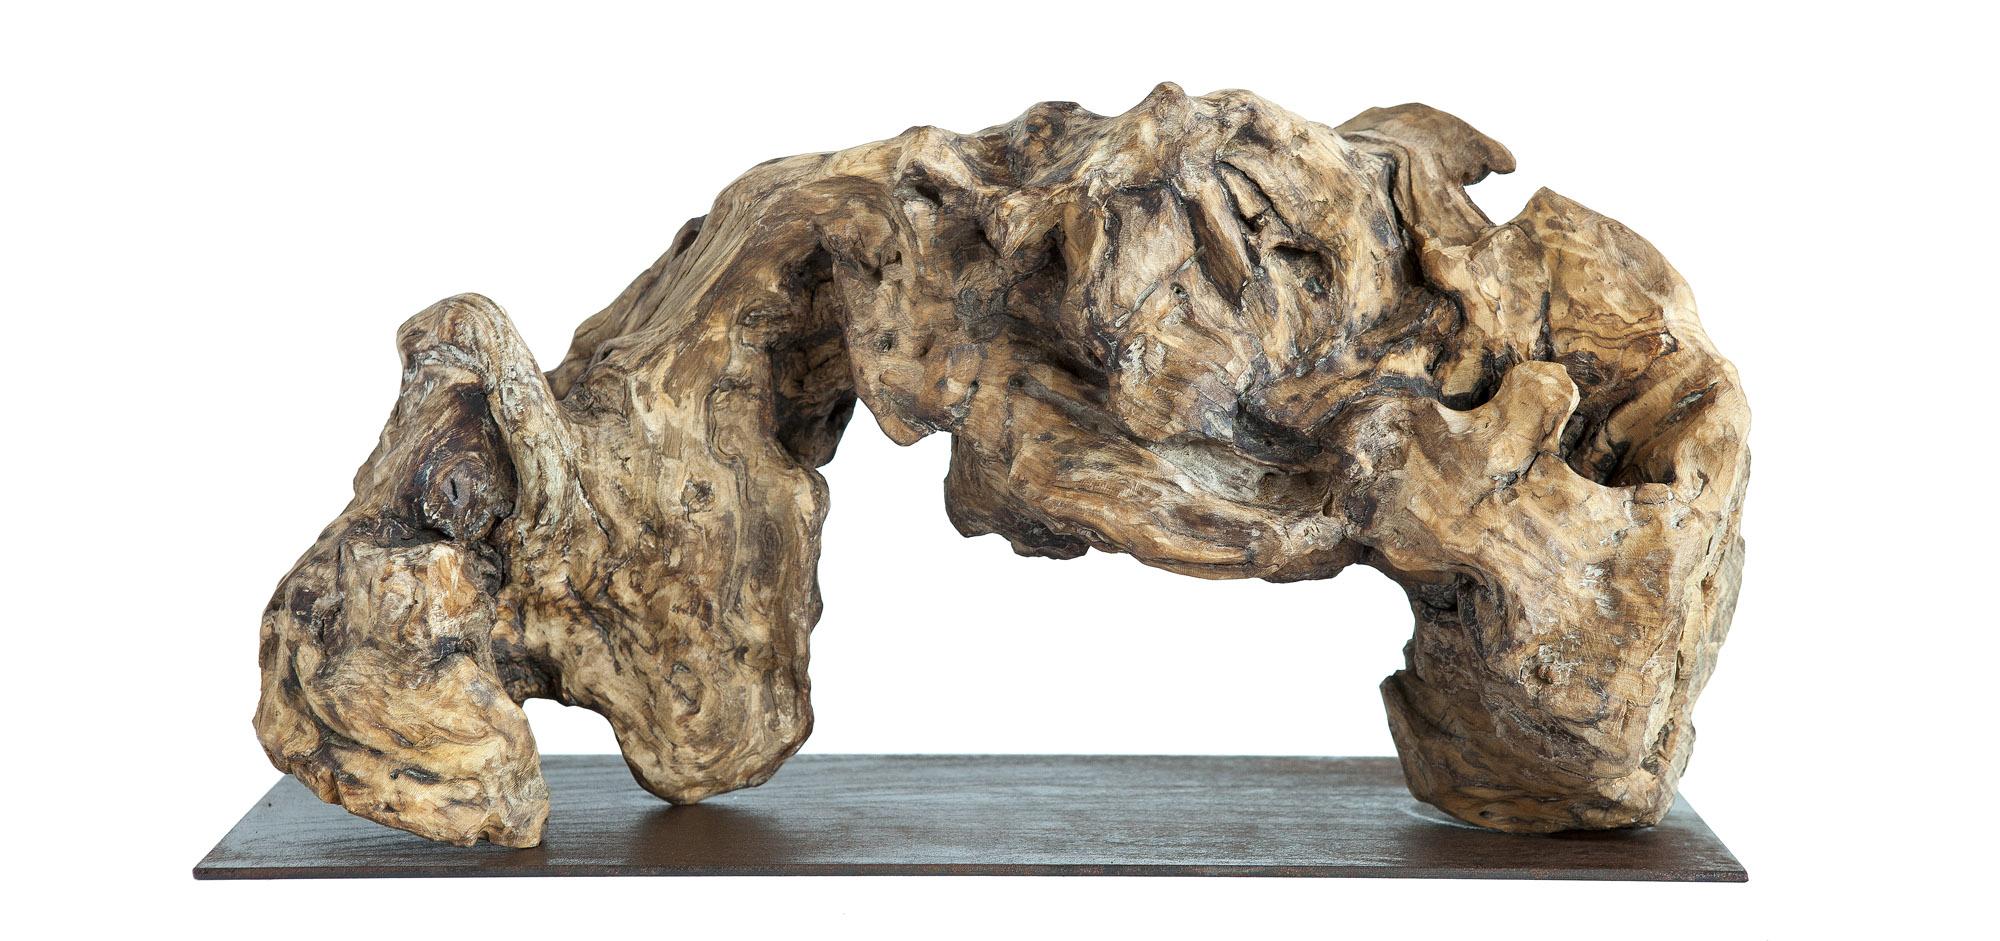 Ola, madera, 20x40x10cm, 2019